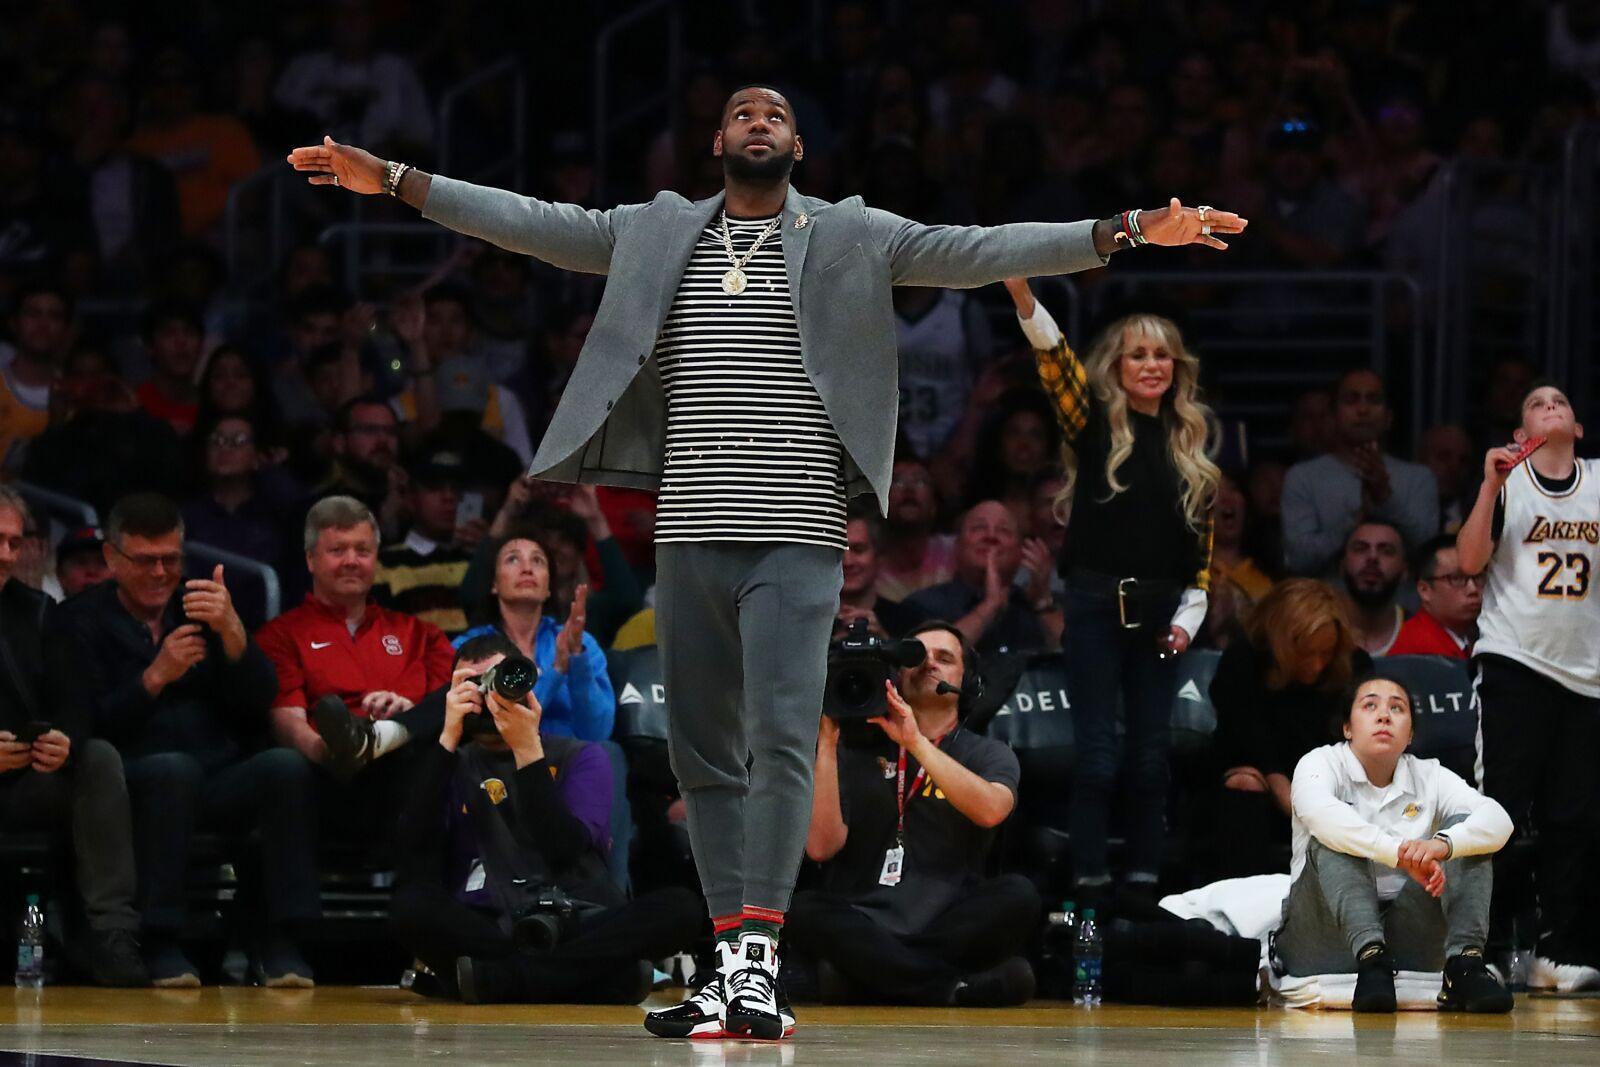 Los Angeles Lakers: Is 2019-20 LeBron's last legit shot at a championship?